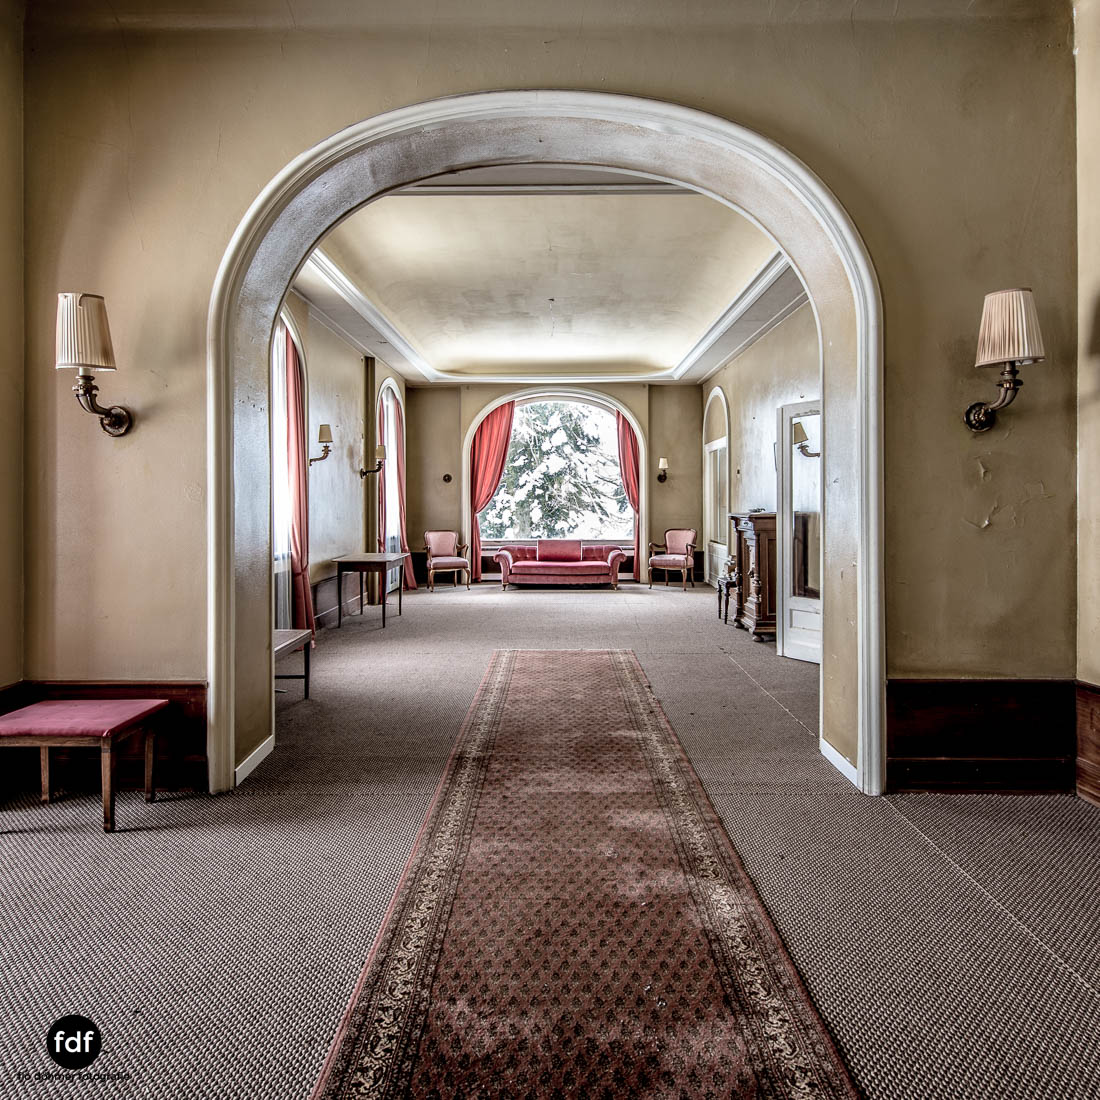 Grand-Hotel-Waldlust-Urbex-Verfall-Freudenstadt-Schwarzwald-102.jpg